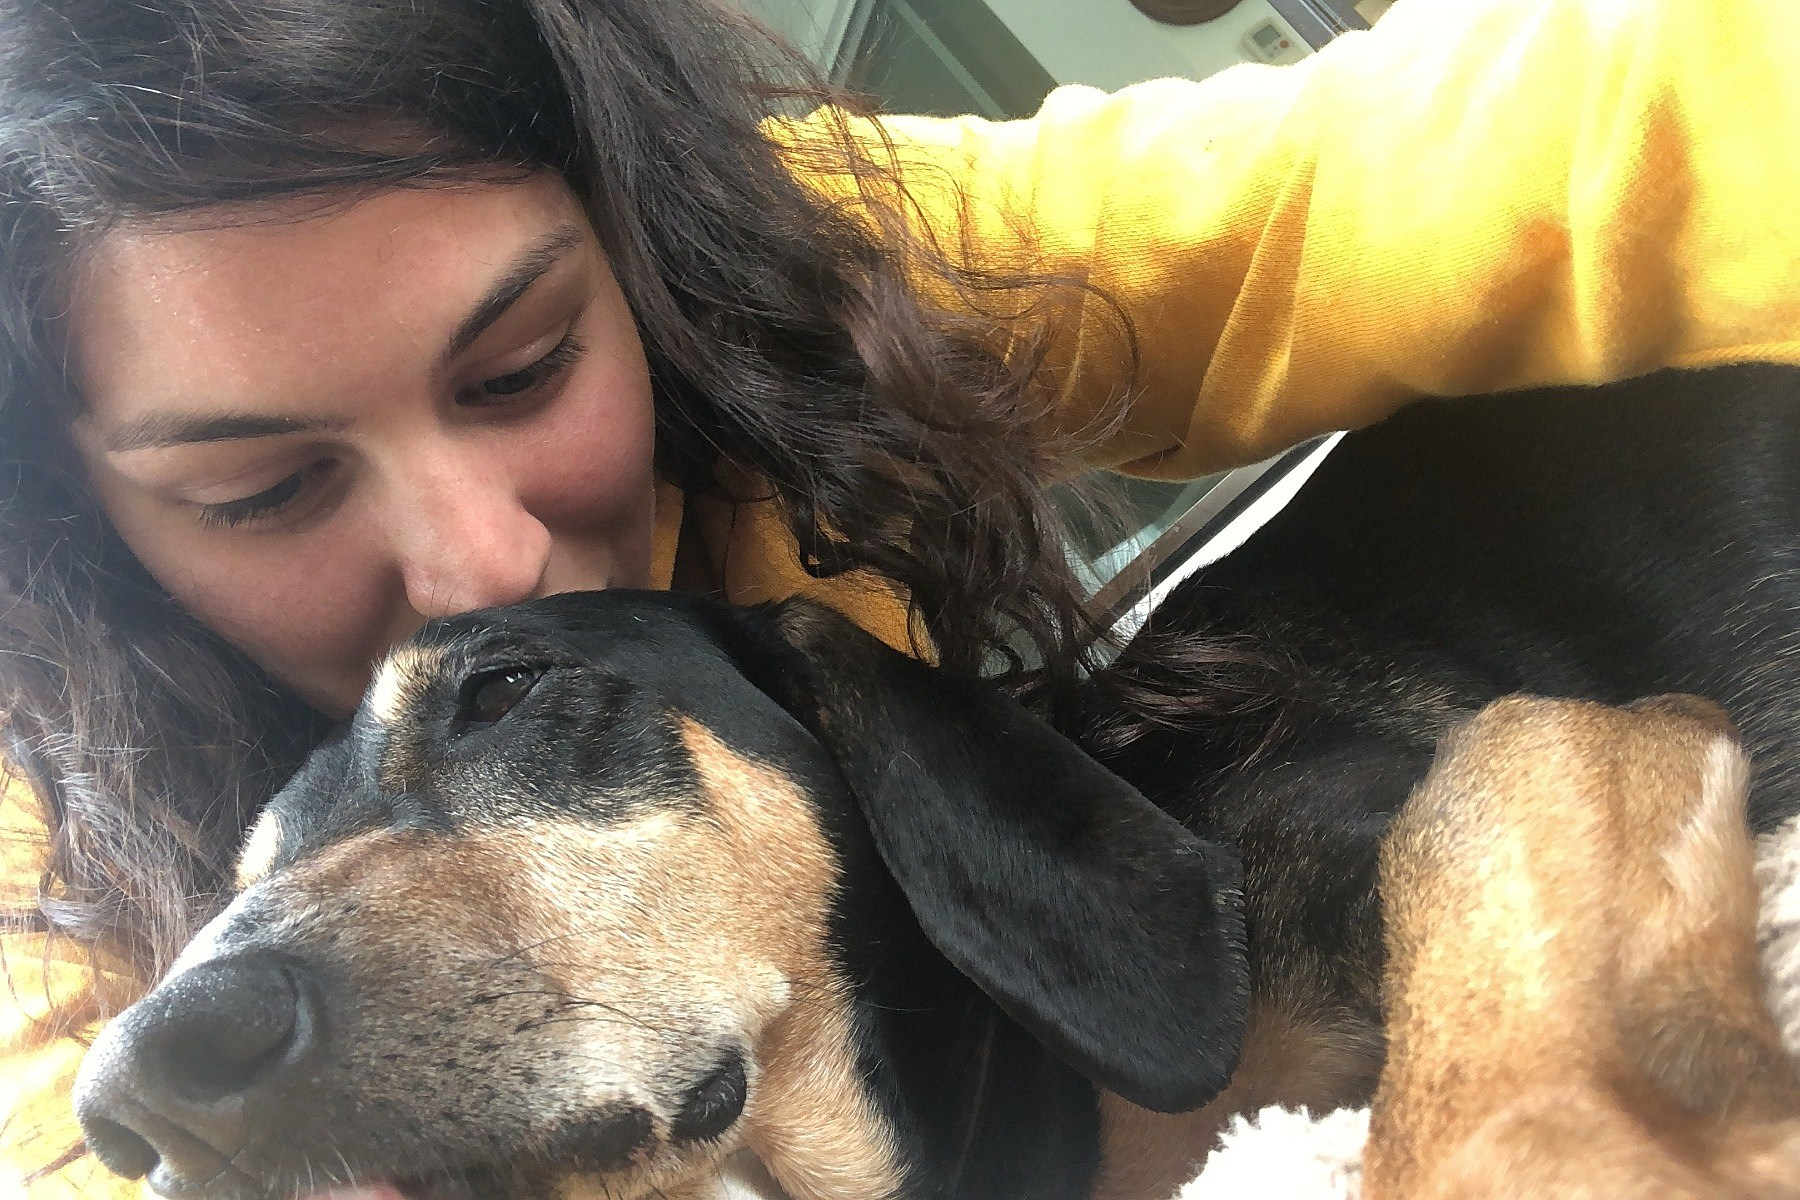 Dog With Cancer Ran Away After Surgery But Good News